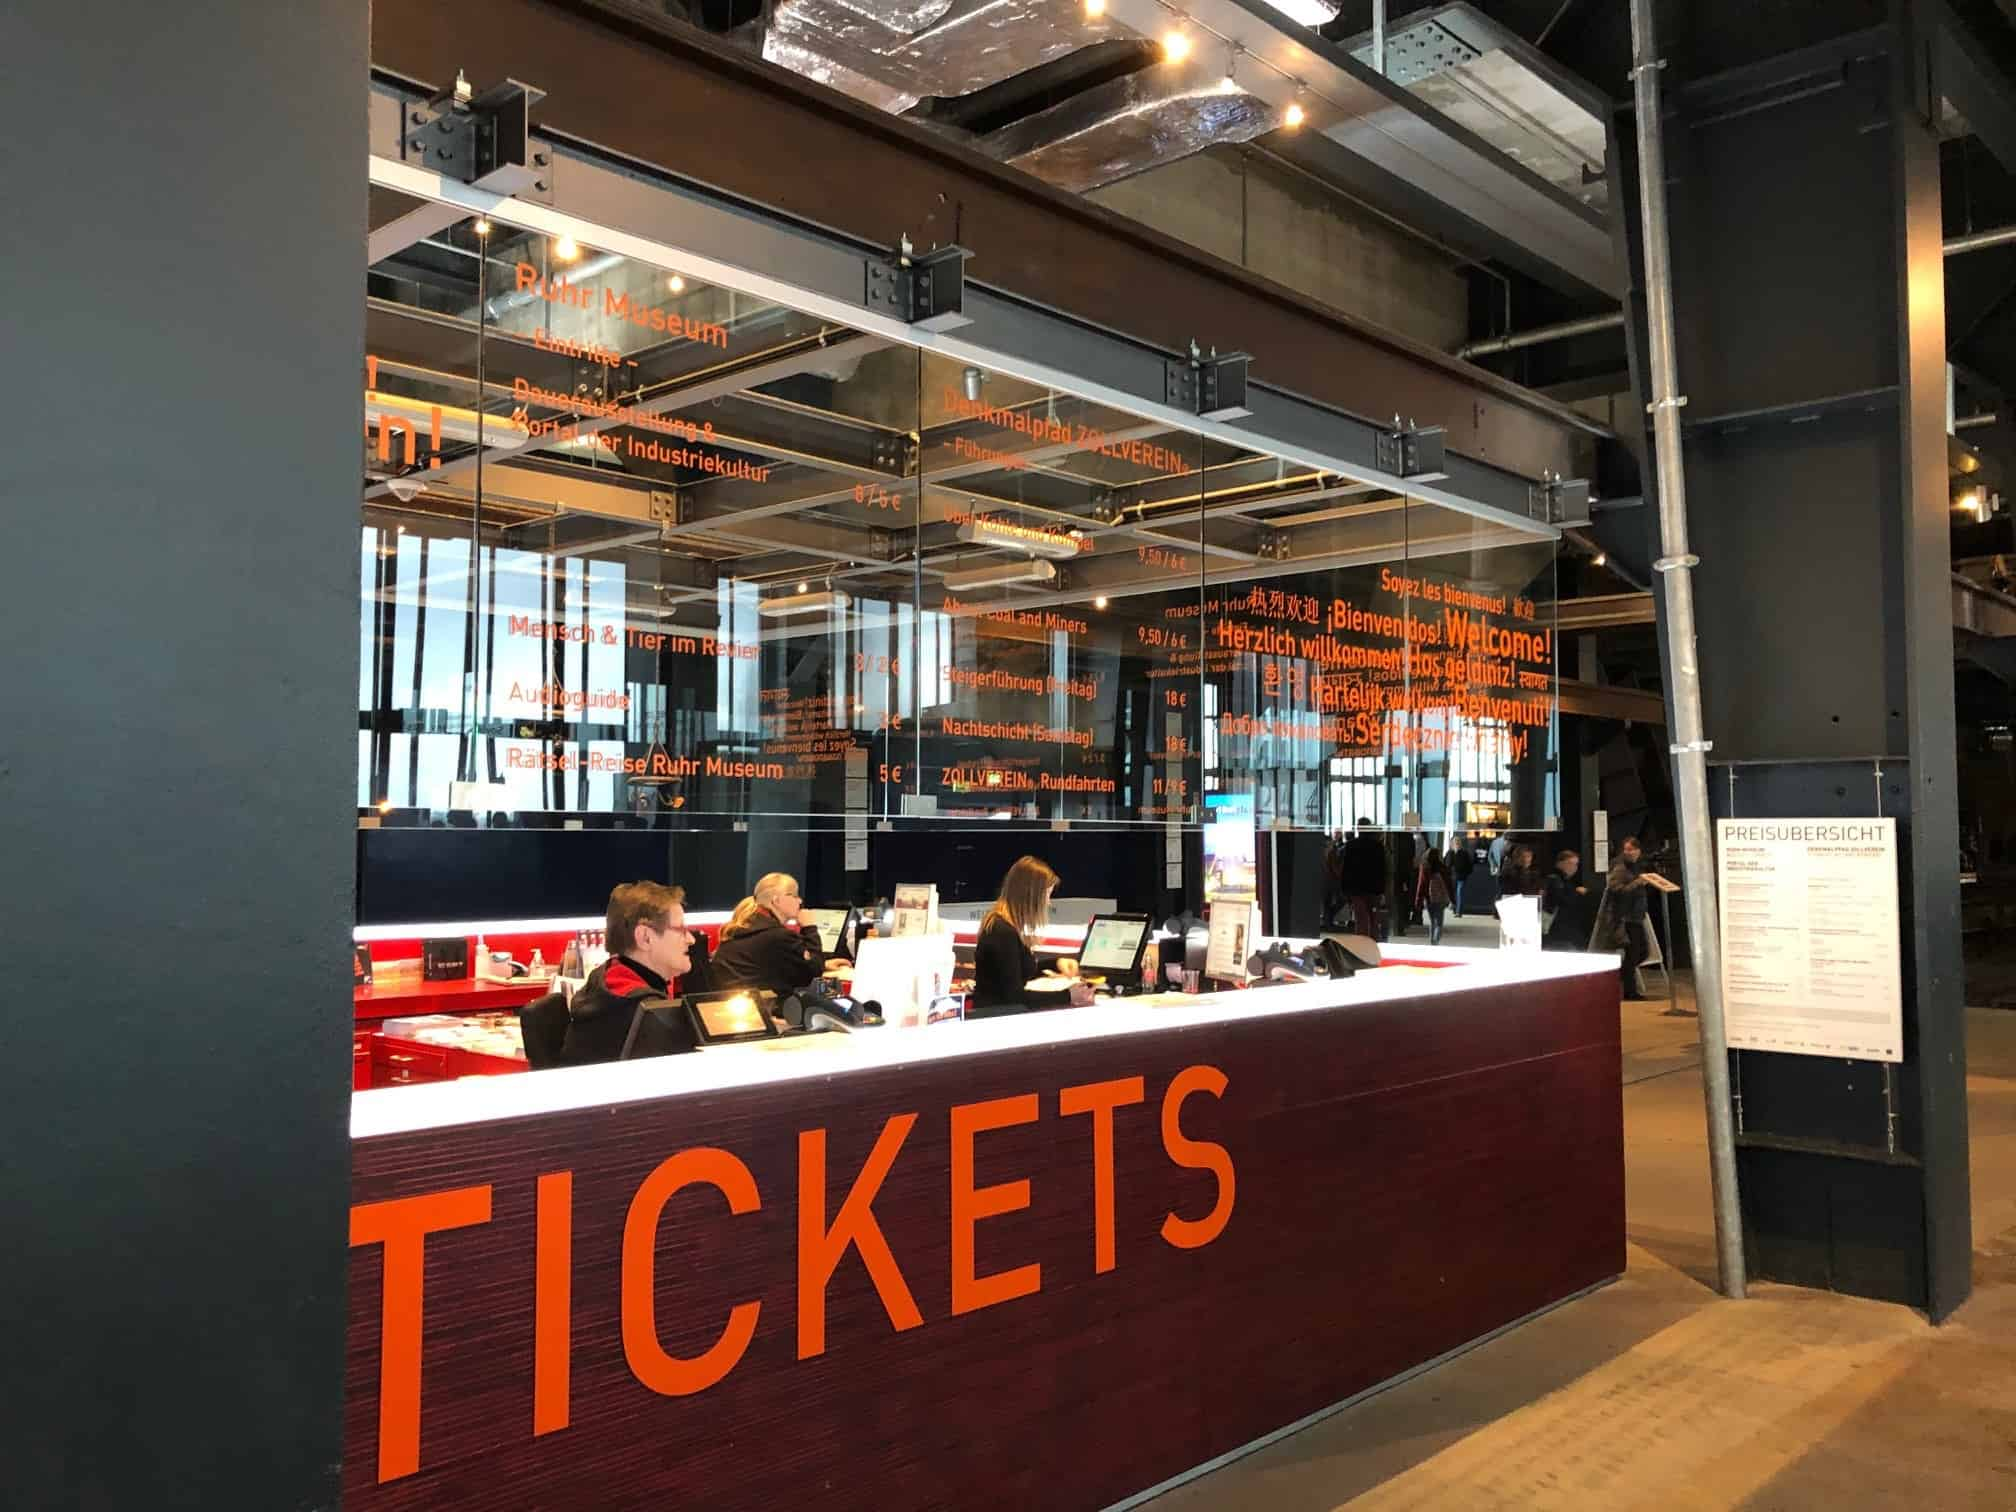 Tickets Ruhr Museum Zeche Zollverein